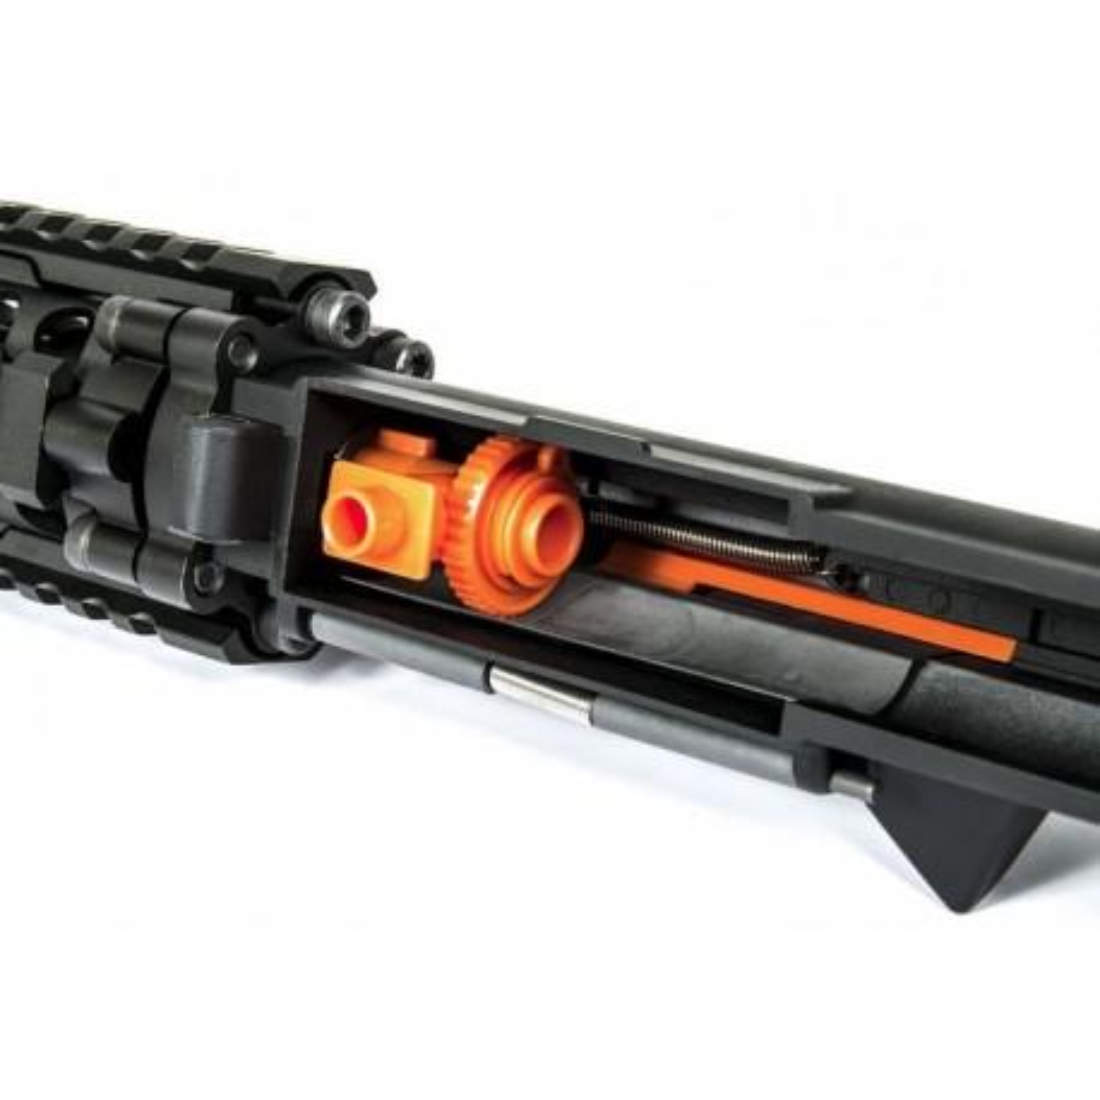 AEG Recon MK18 Mod.1 10.8 Metal black [Evolution]